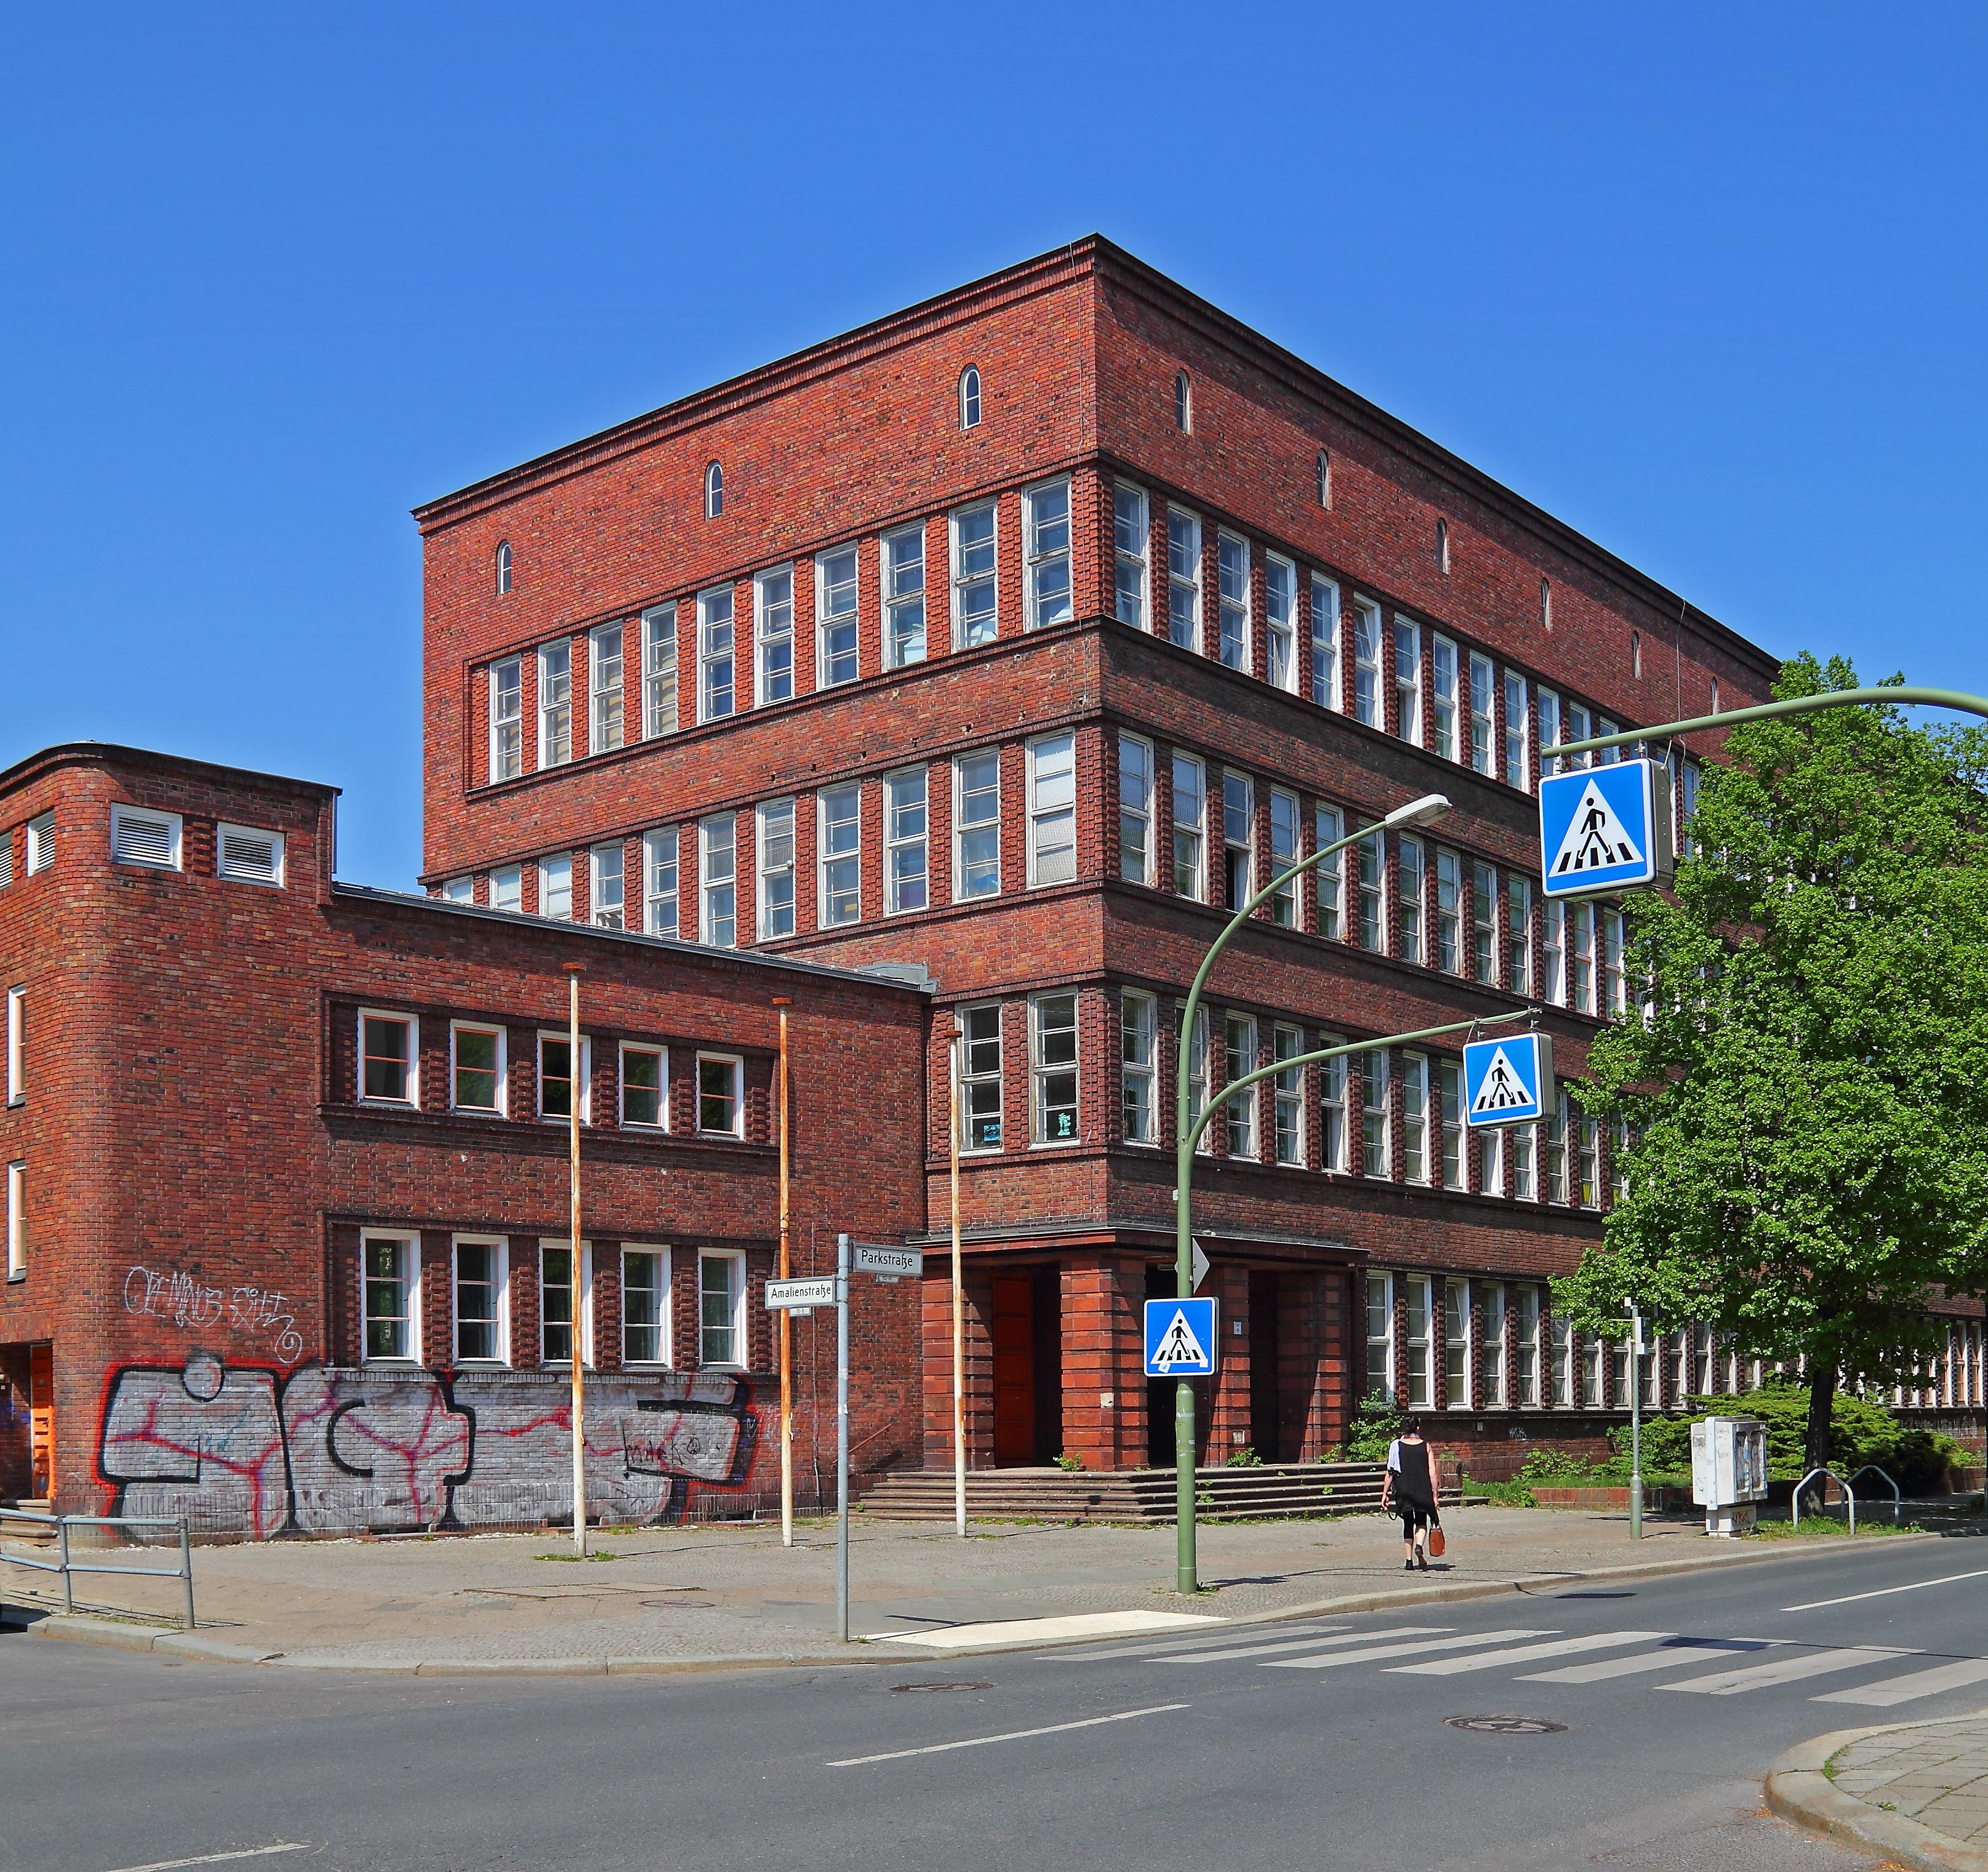 file berlin weissensee parkstr wikimedia commons. Black Bedroom Furniture Sets. Home Design Ideas